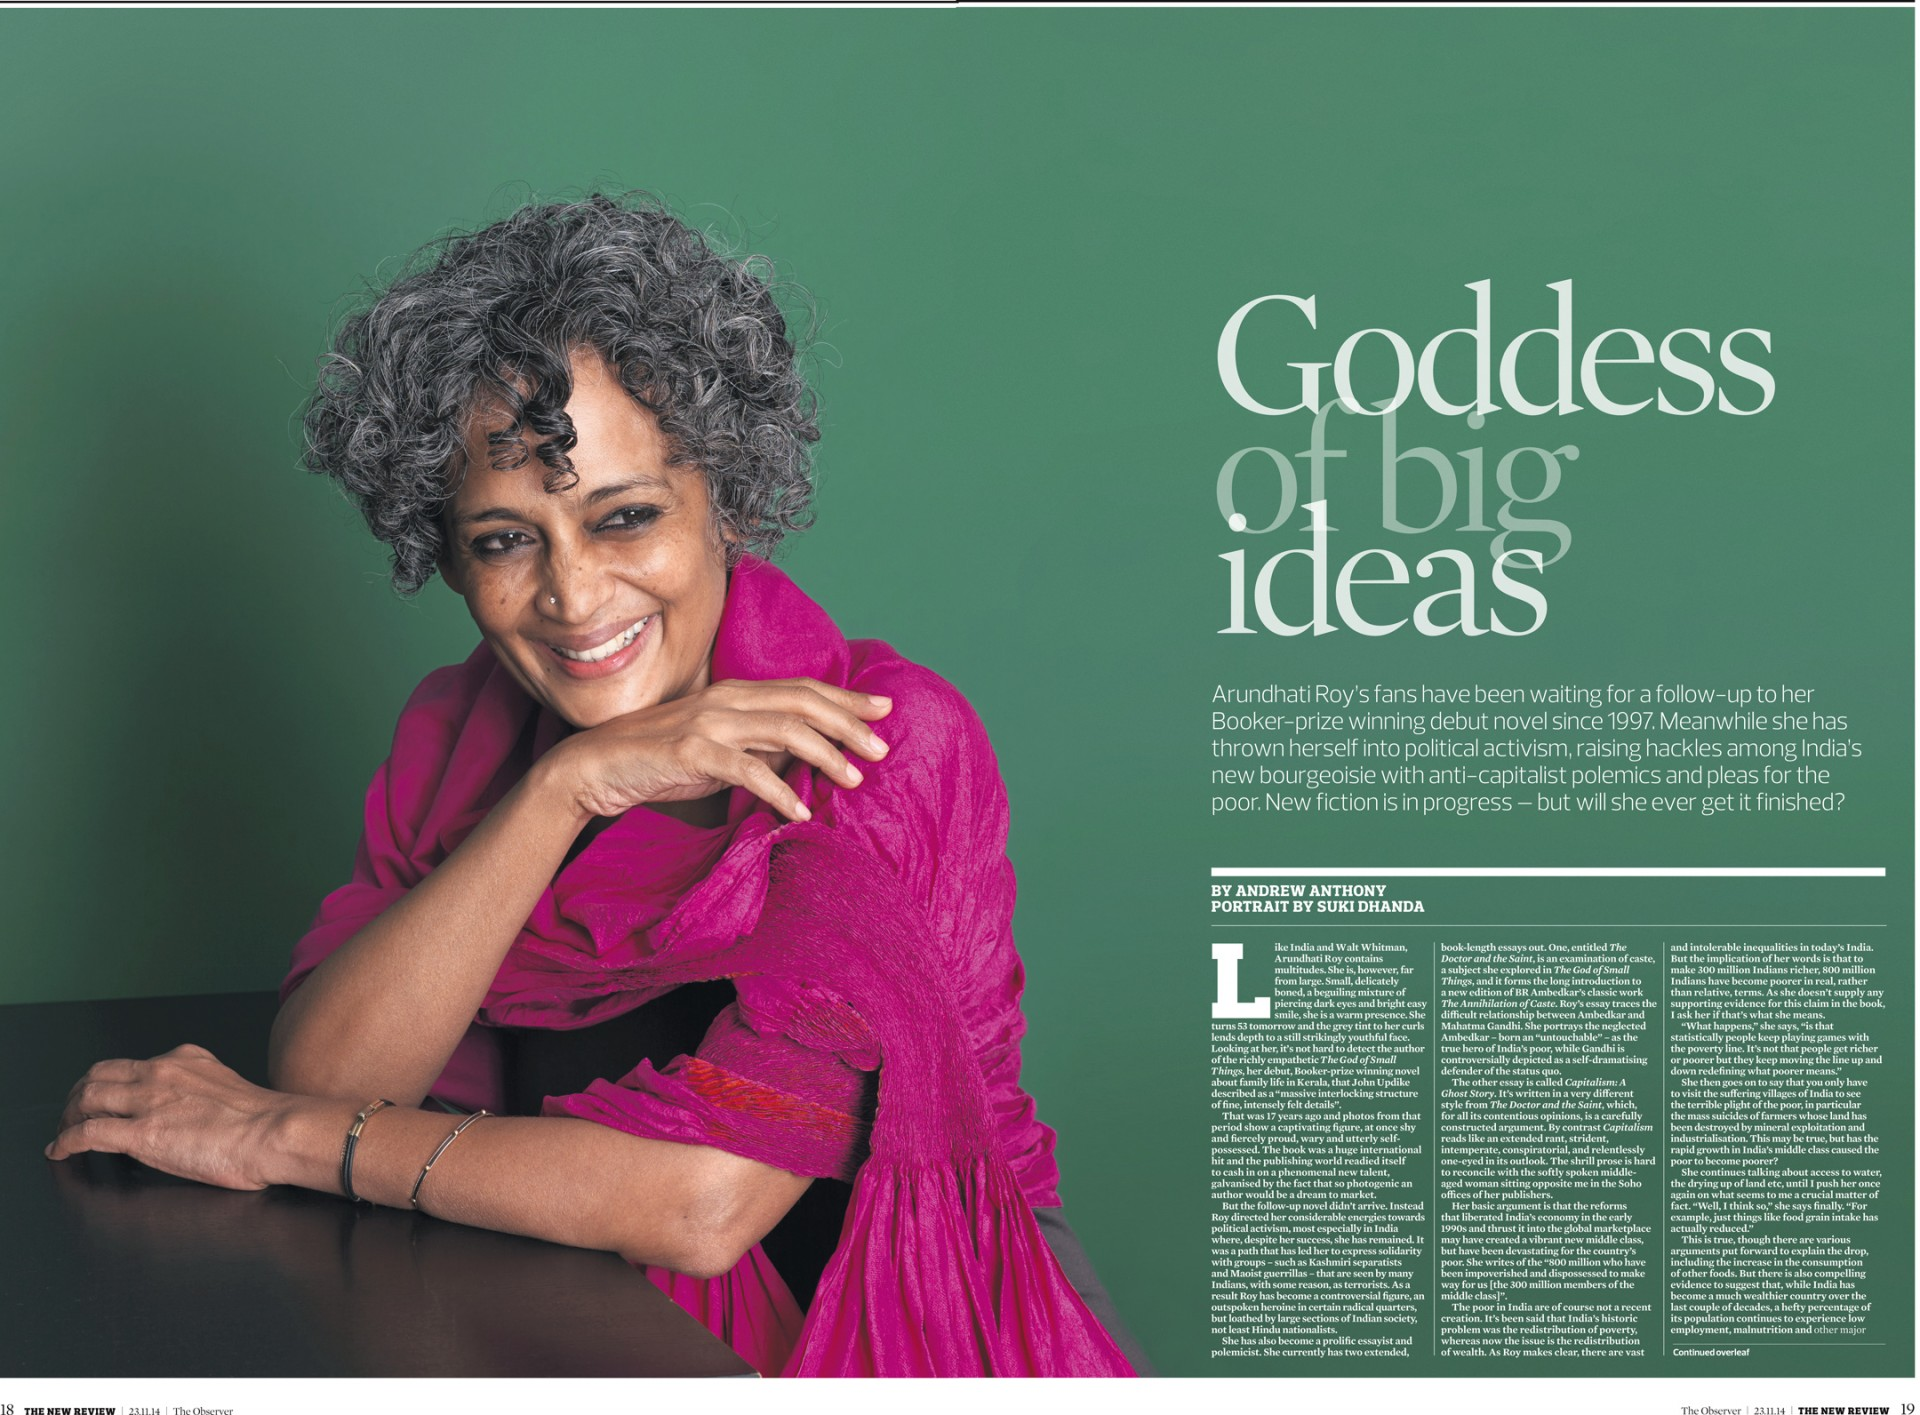 008 Roy Essays By Arundhati Essay Sensational 1920